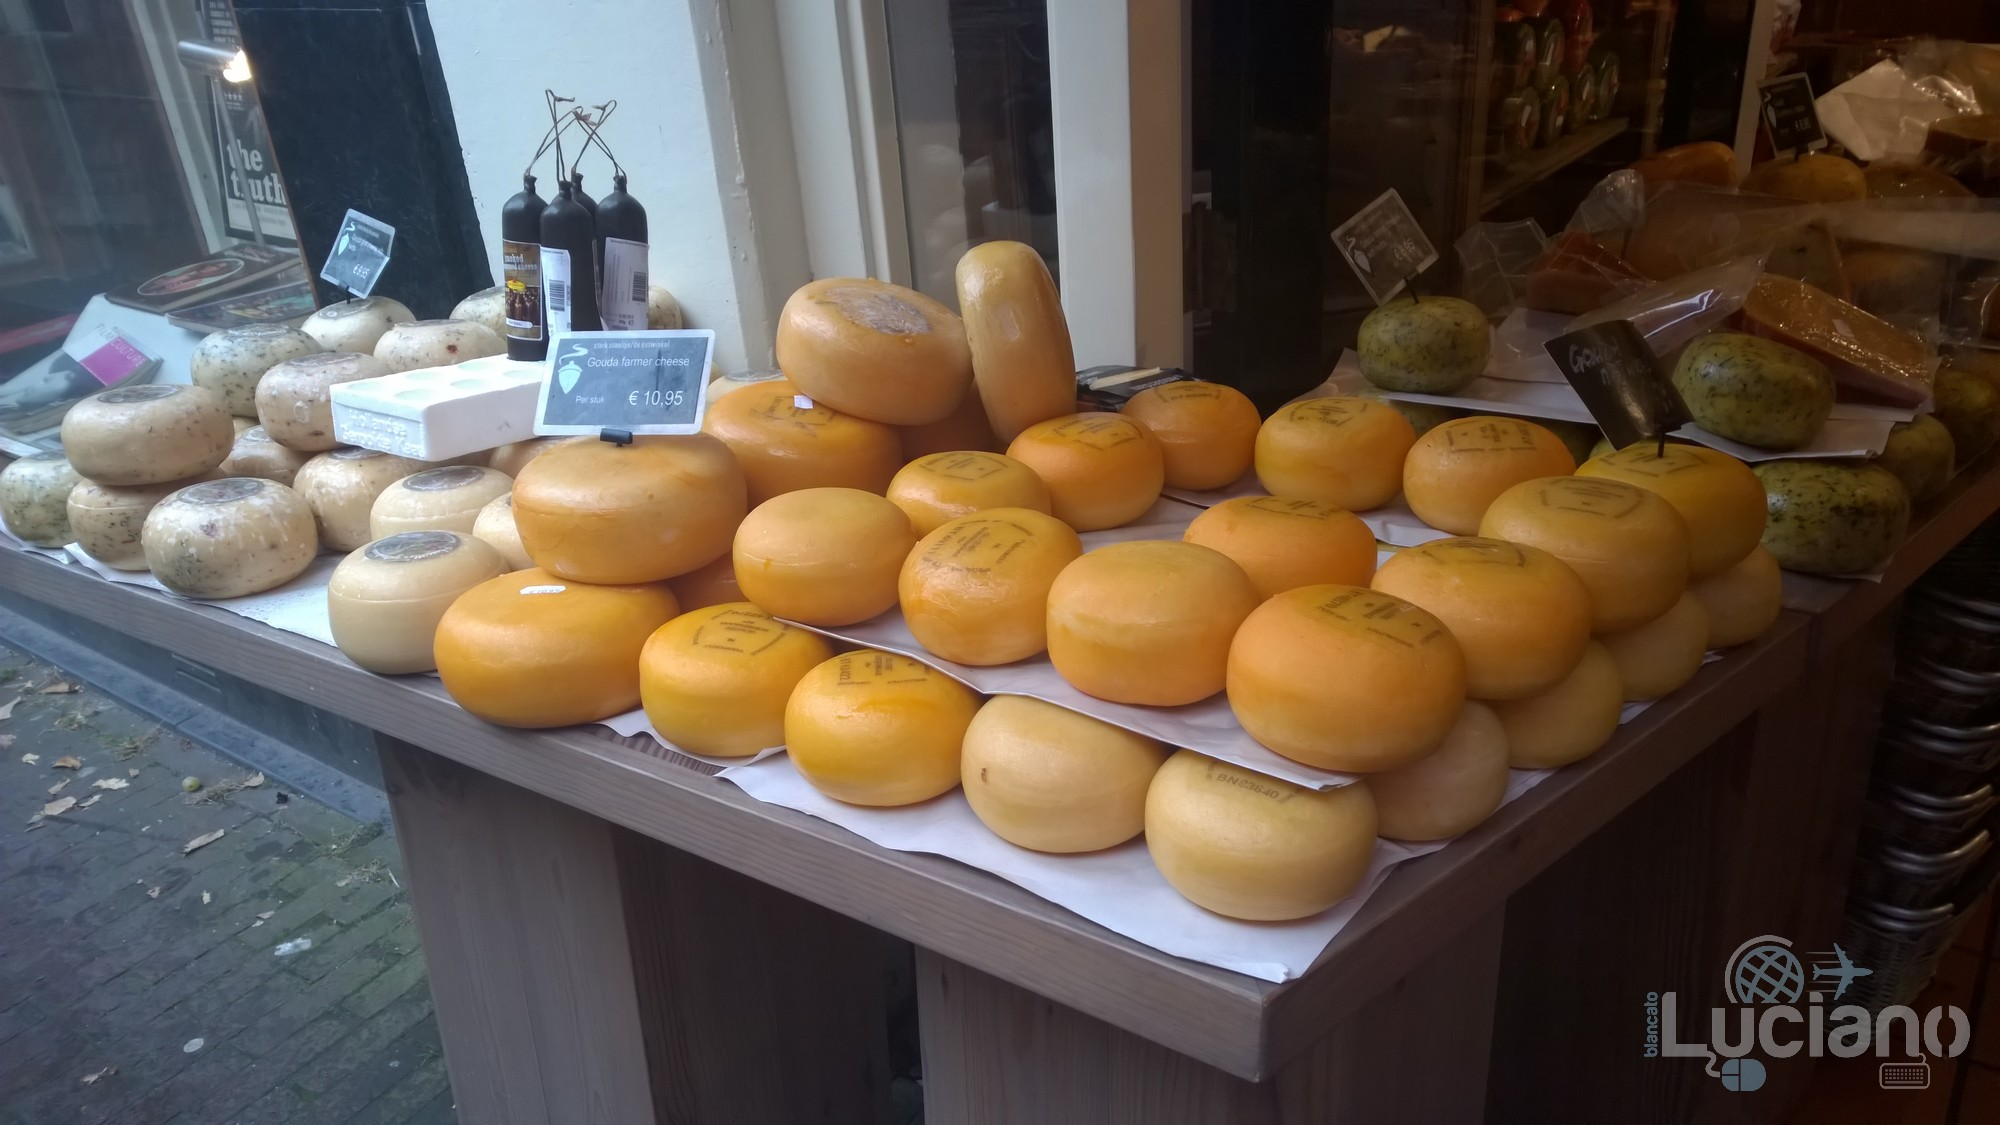 amsterdam-2014-vueling-lucianoblancatoit (168)